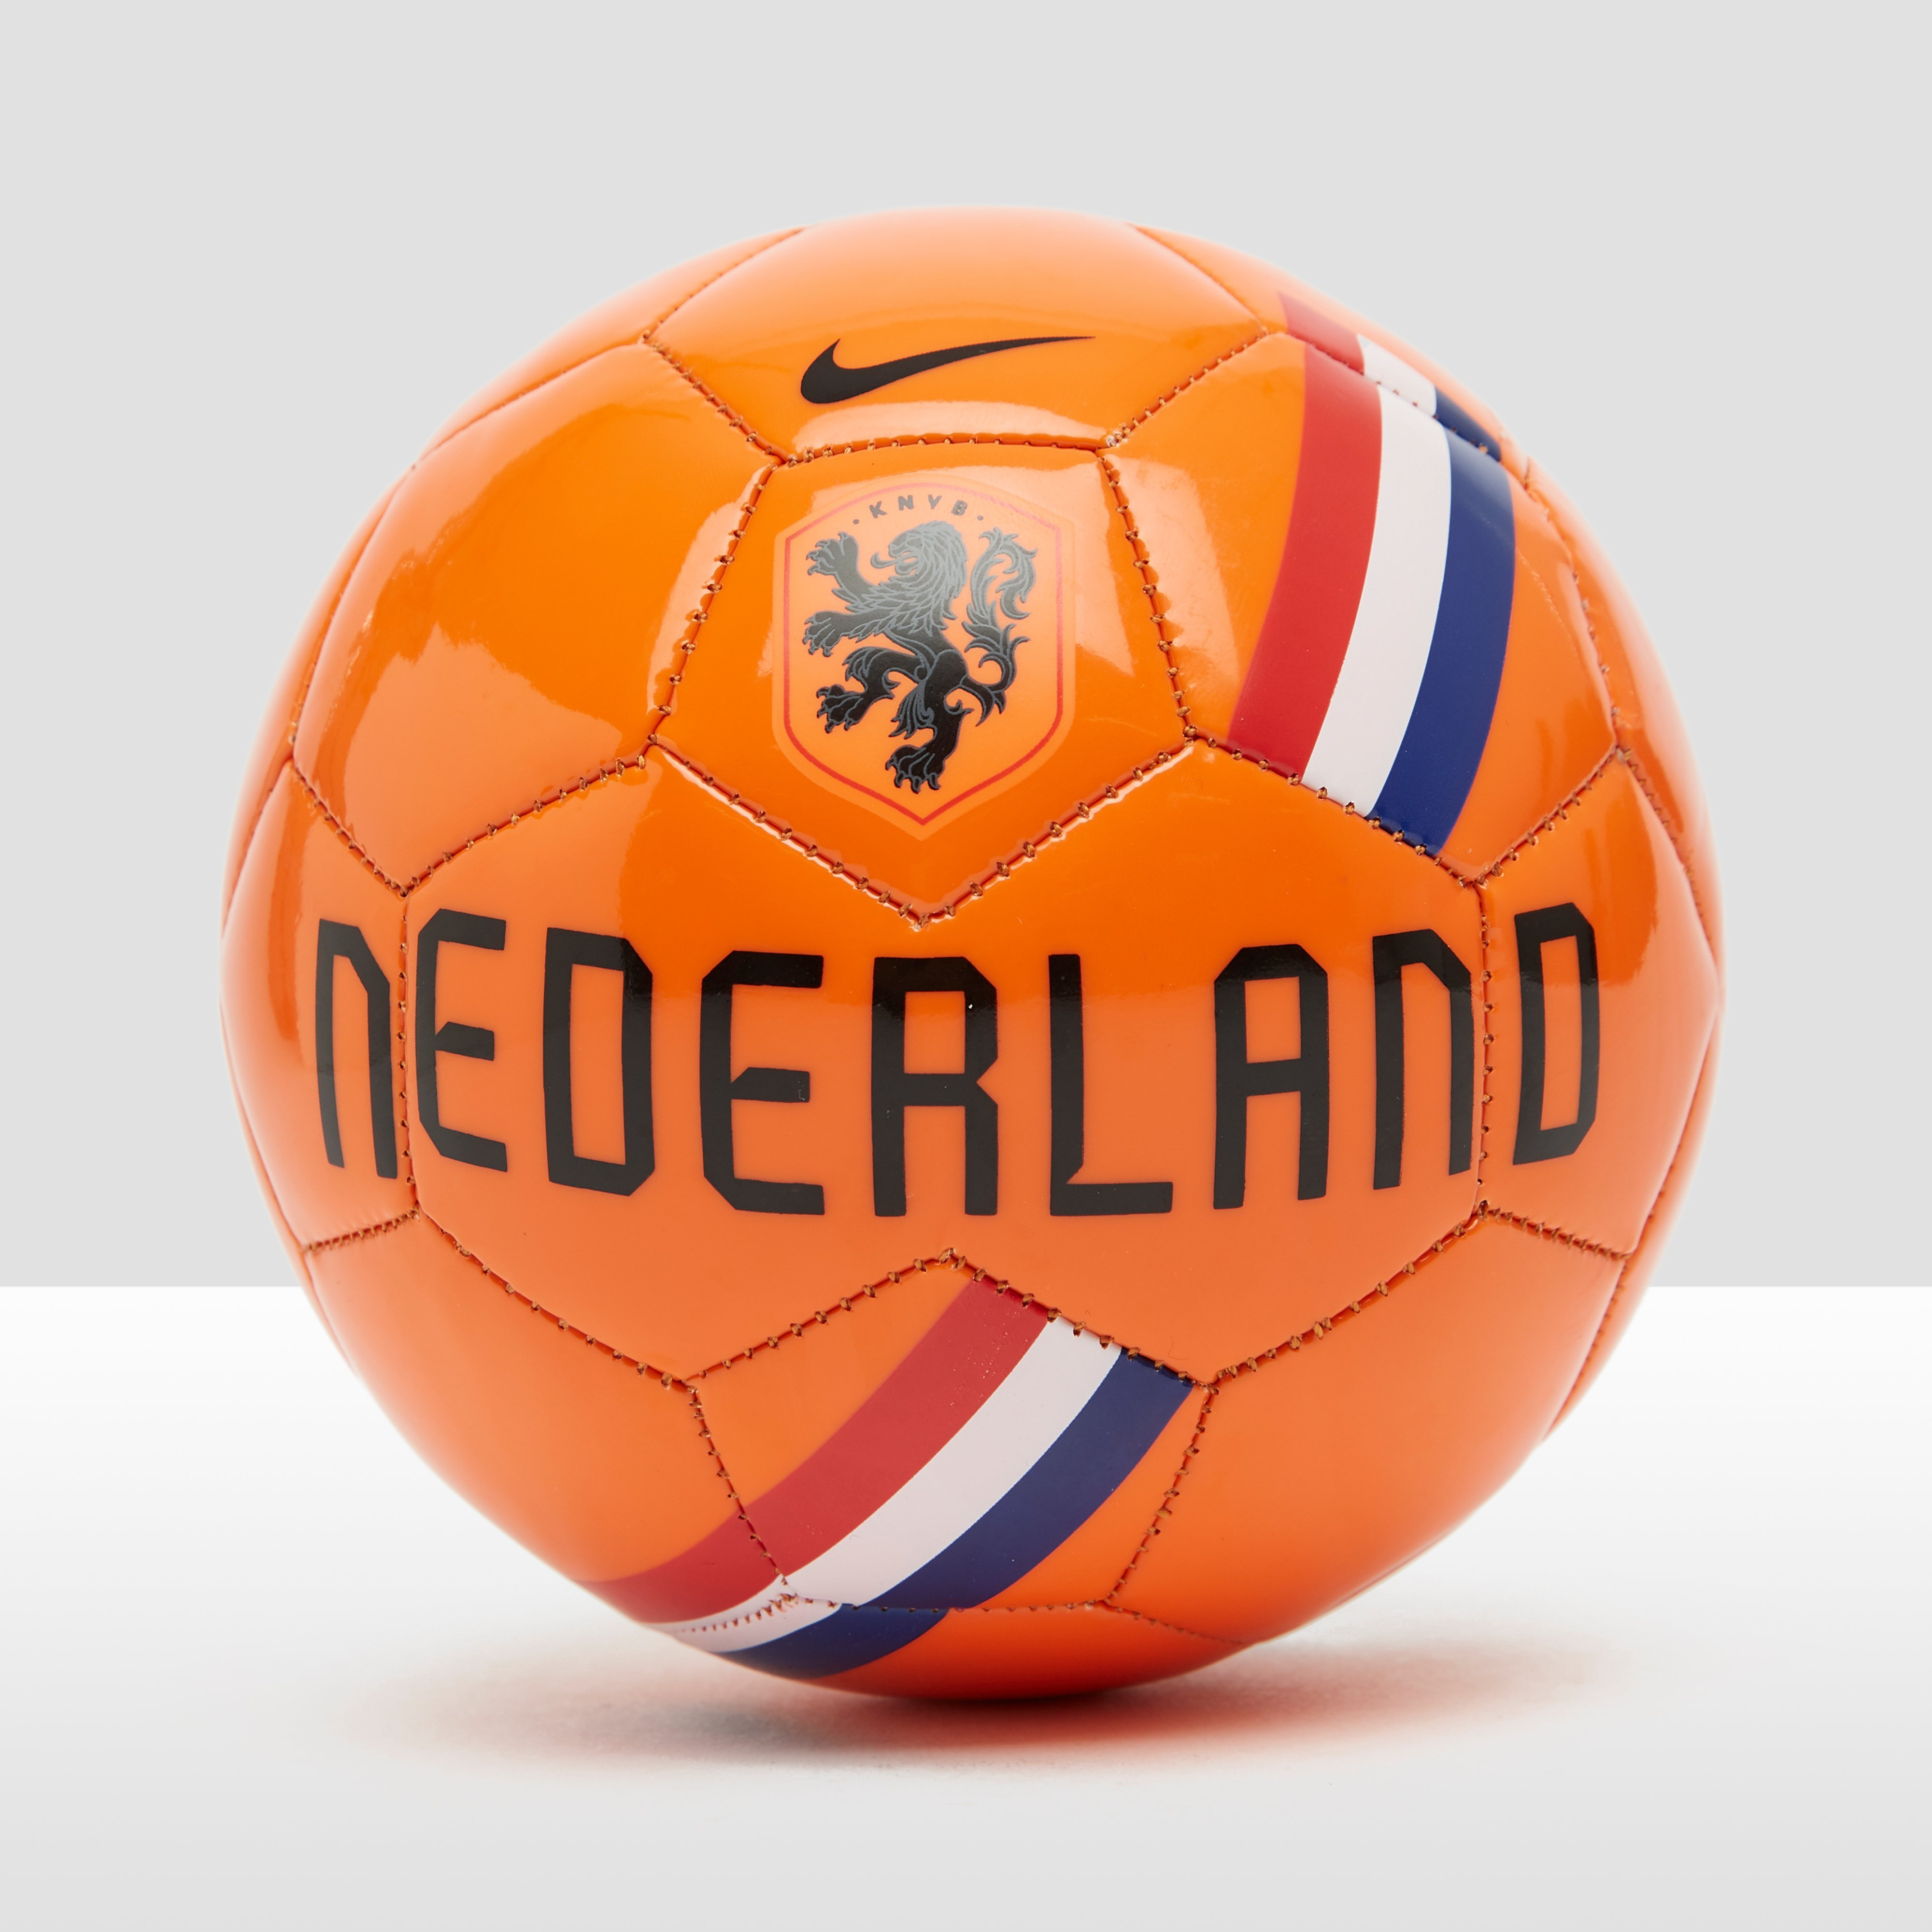 NIKE KNVB SKILLS NL VOETBAL ZWART/ORANJE